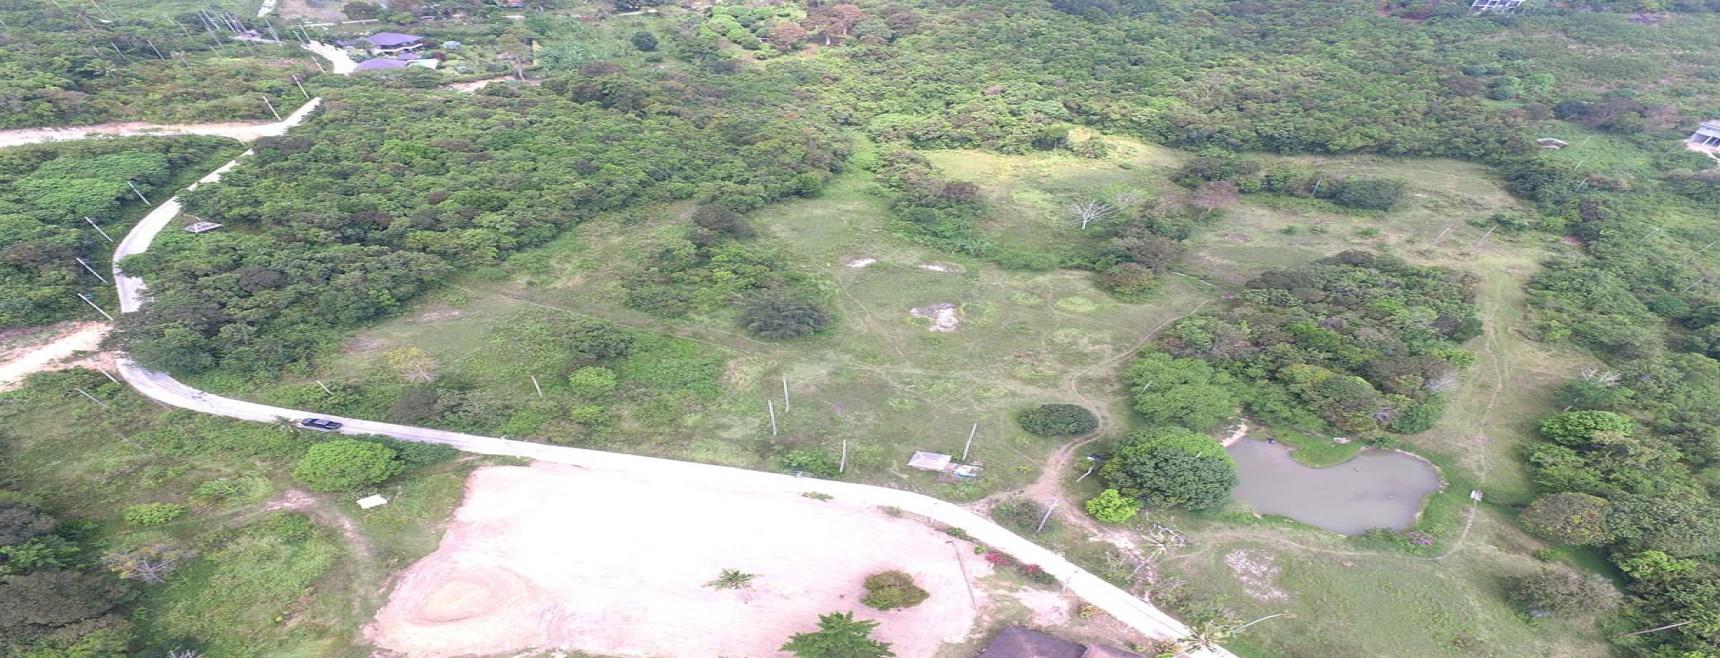 37 Rai Development Land in Bophut, Koh Samui (Thai-Real.com)